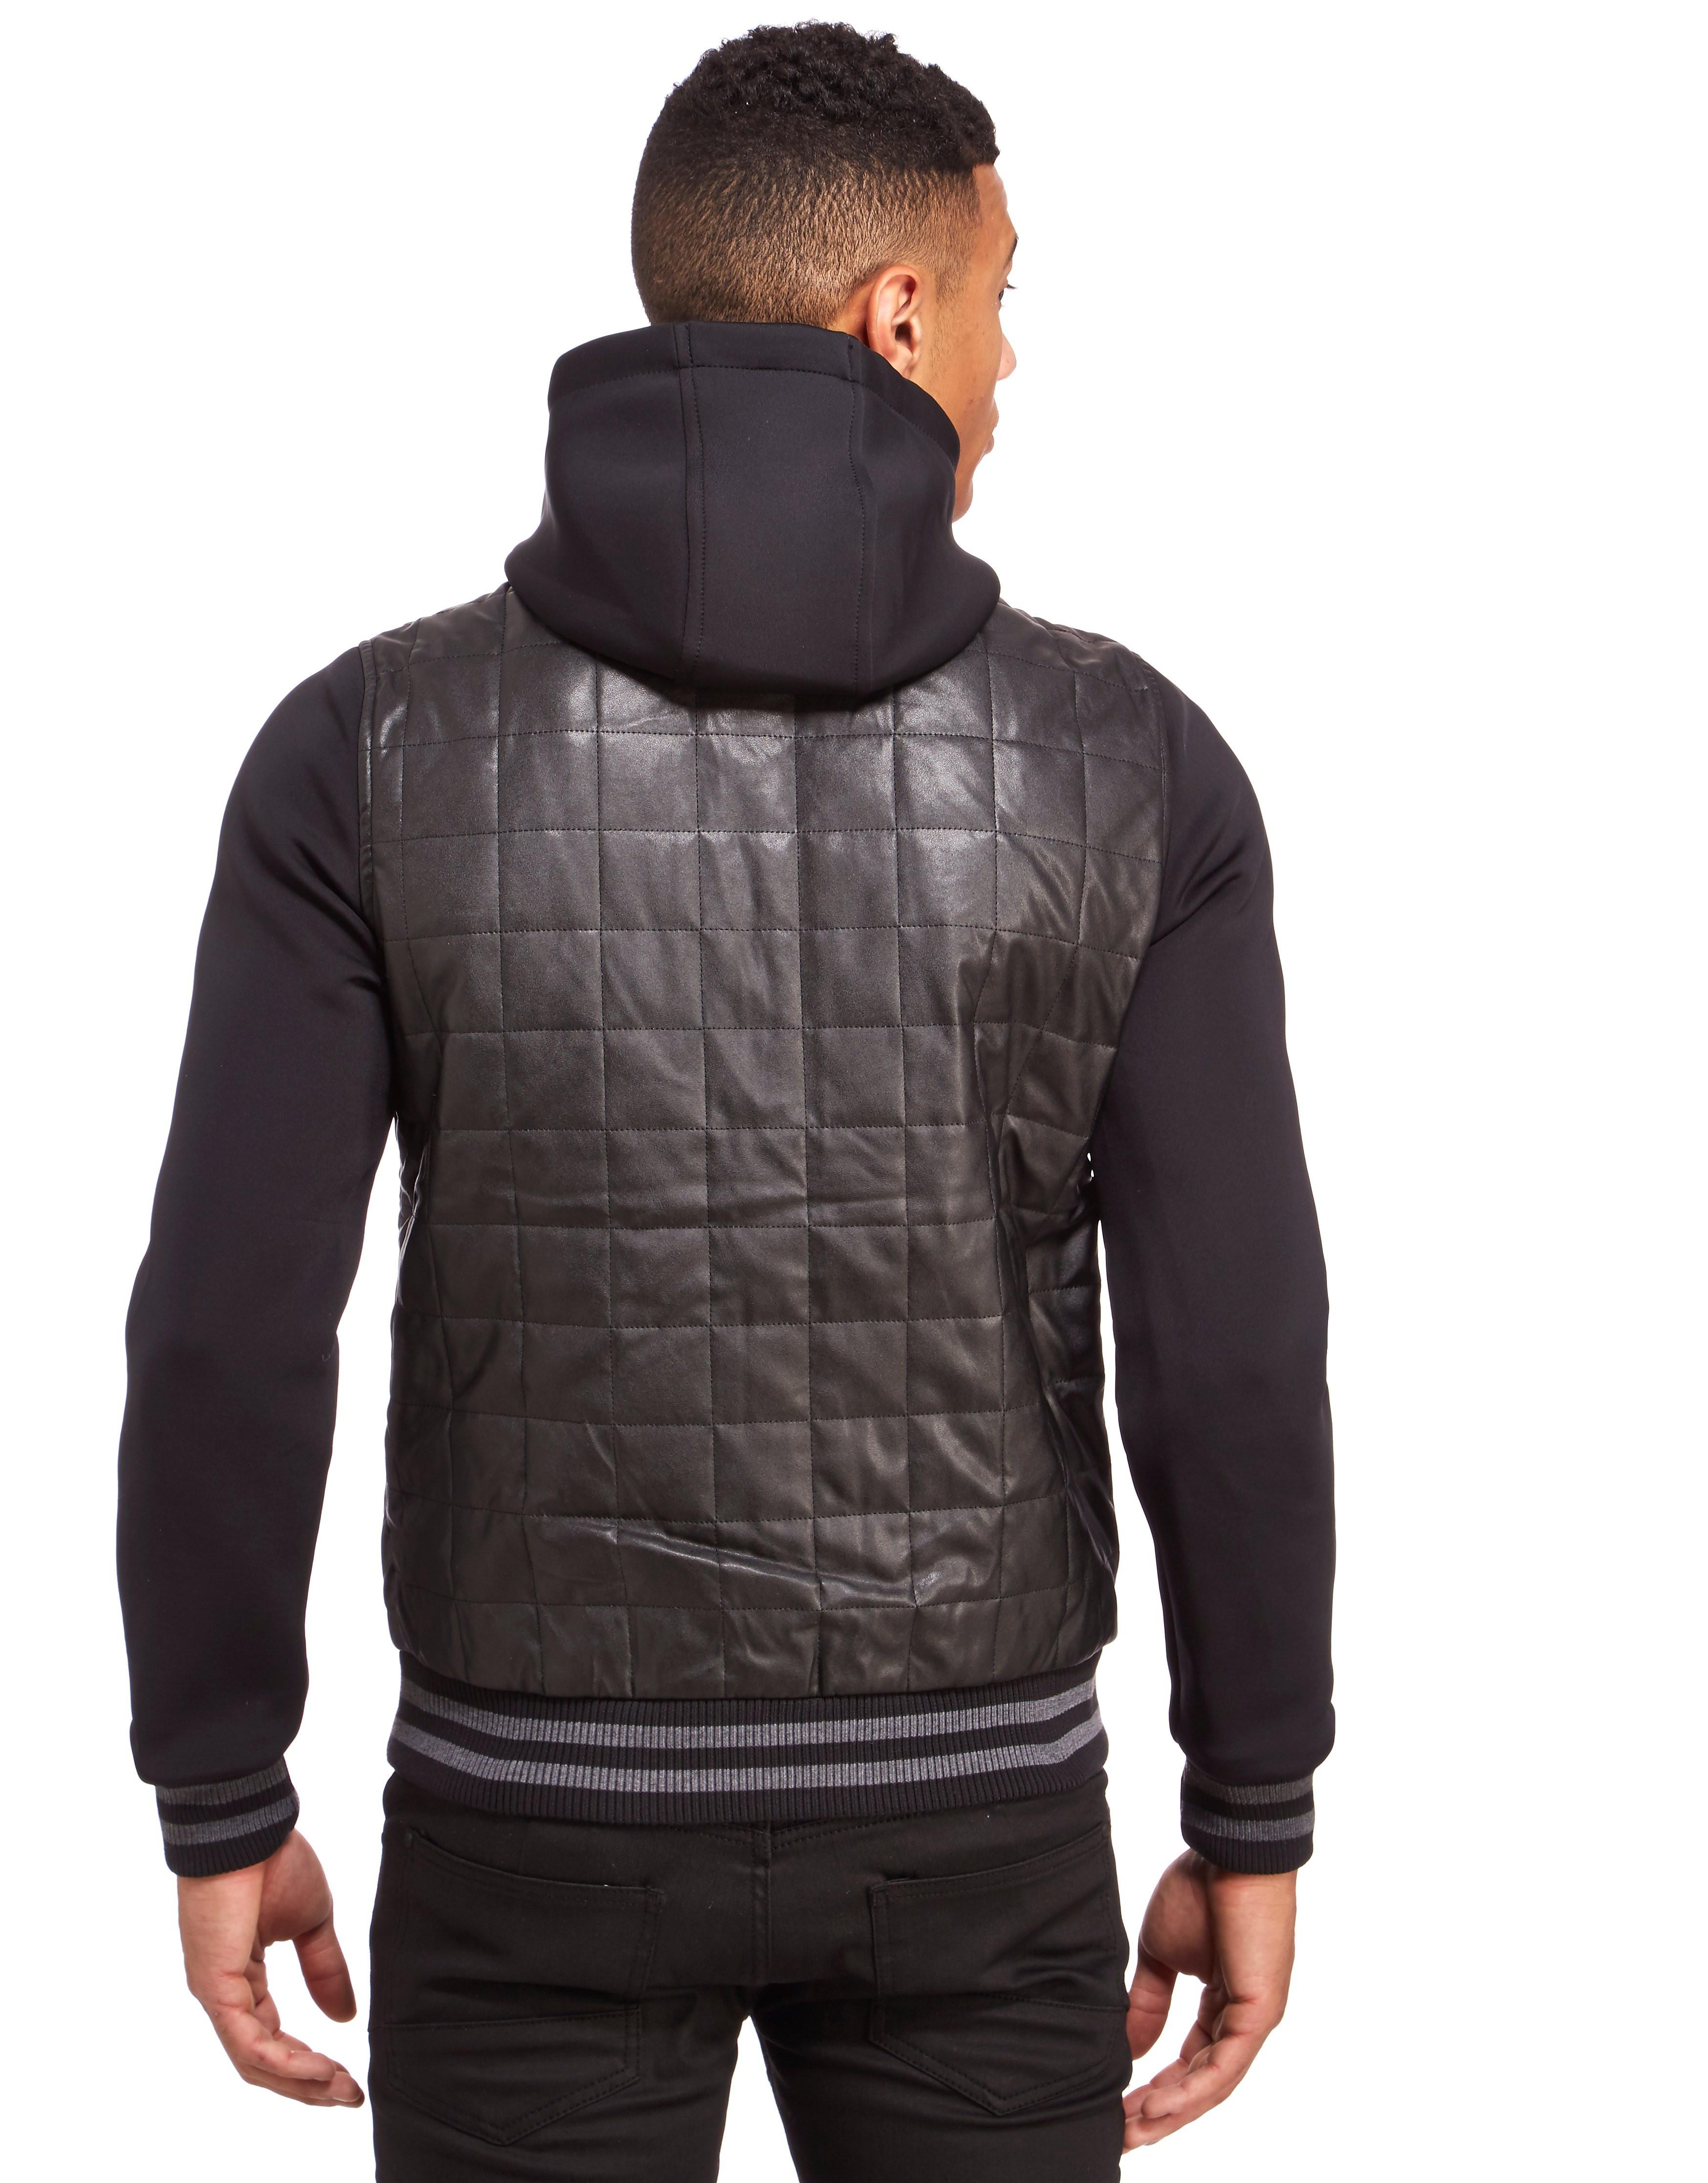 Supply & Demand Desmate 2 Jacket